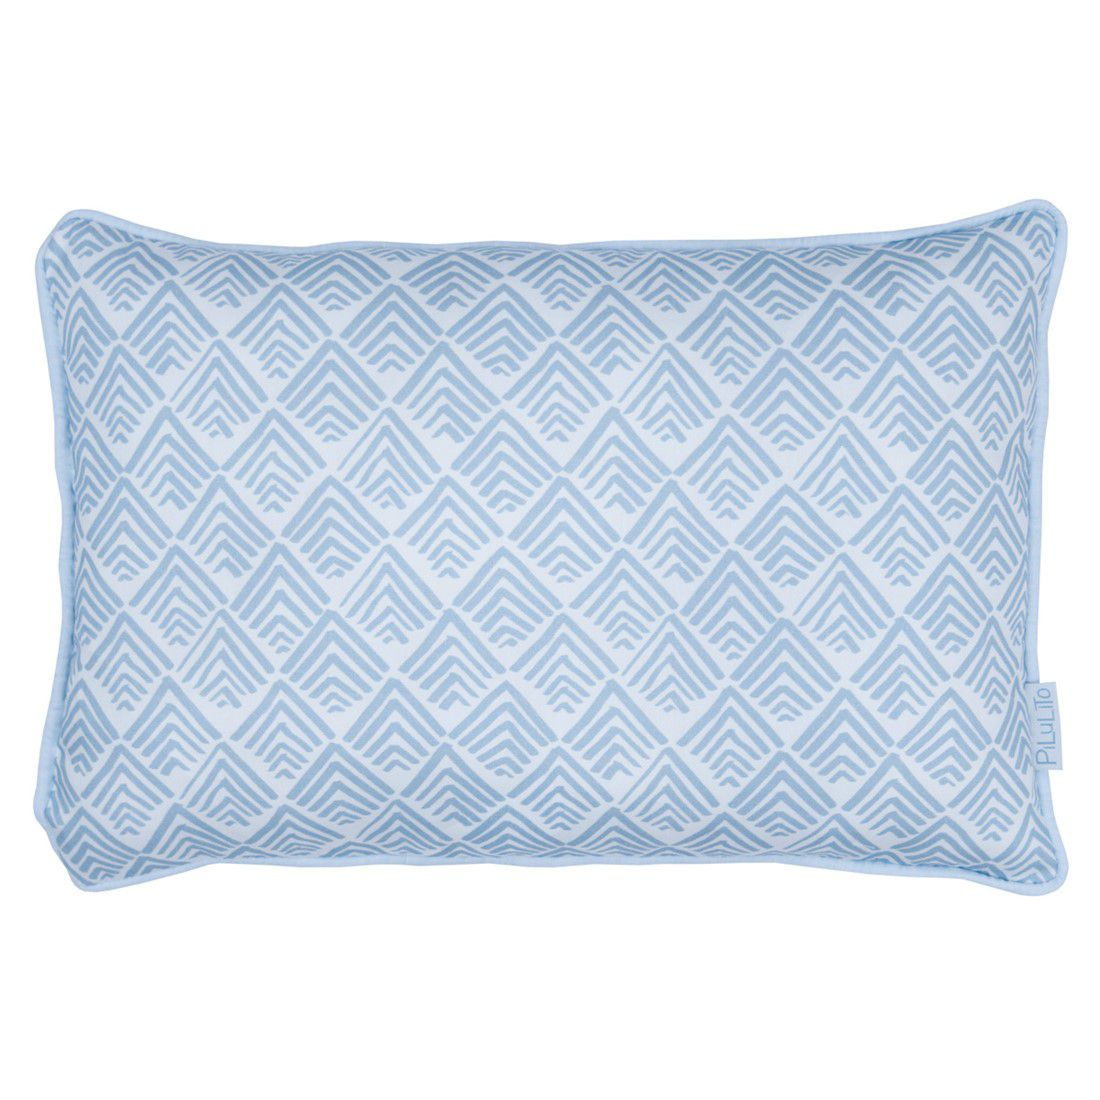 Capa de almofada 45x30cm oca azul céu